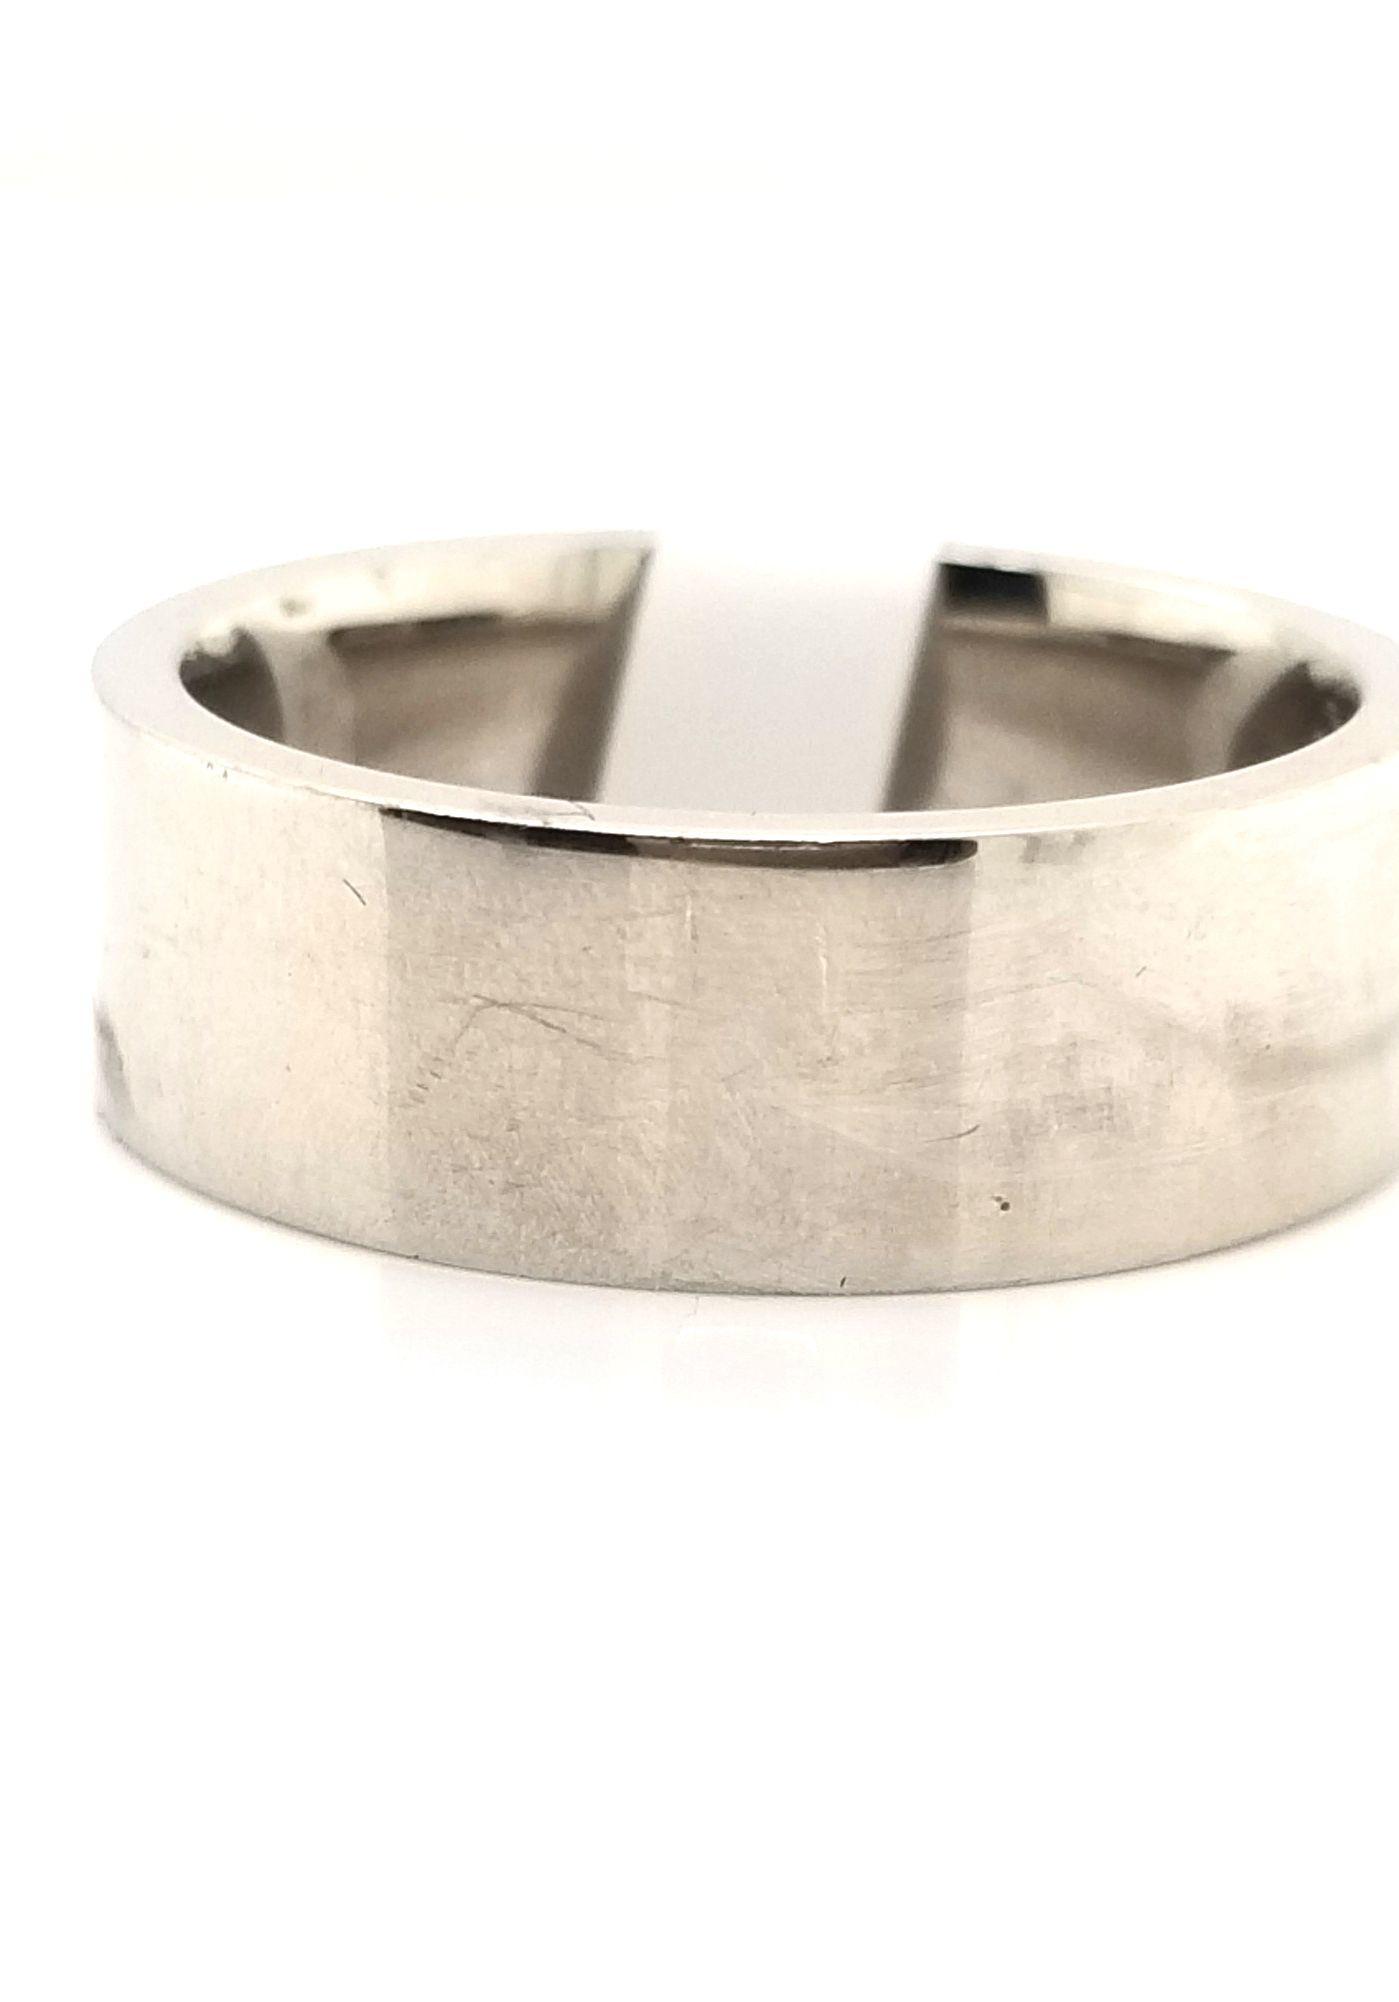 Palladium Ring, size 8.5, flat comfort fit